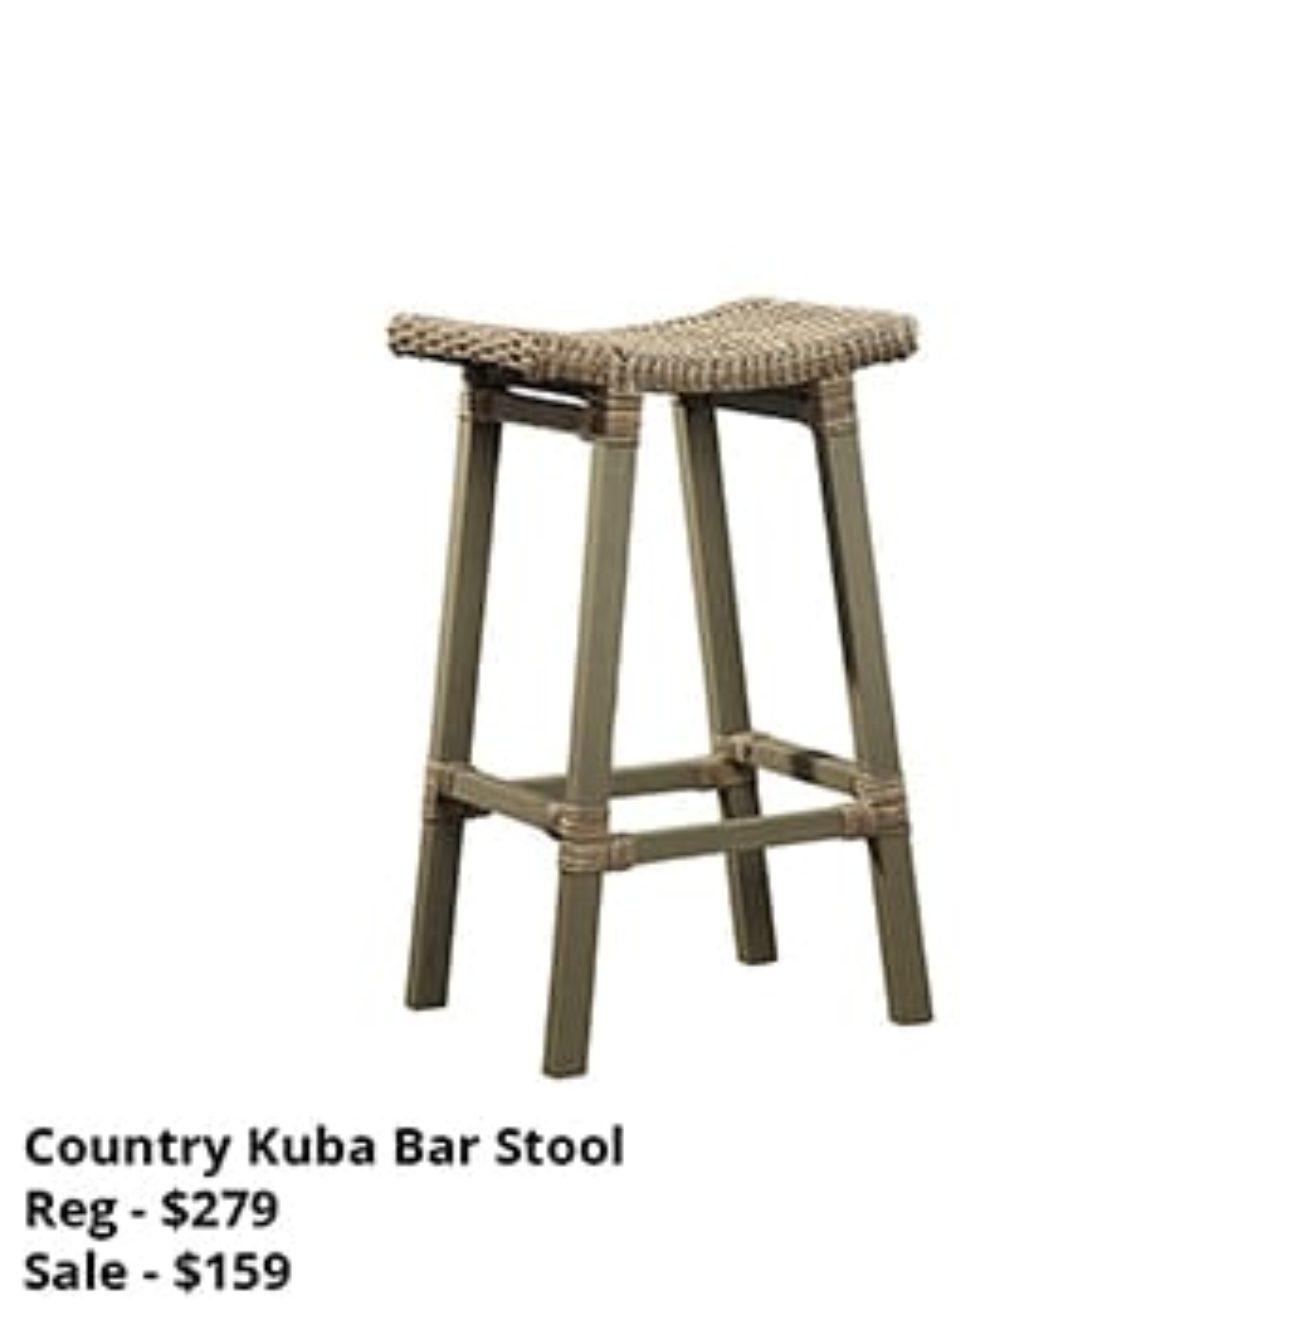 Country Kuba Bar Stool